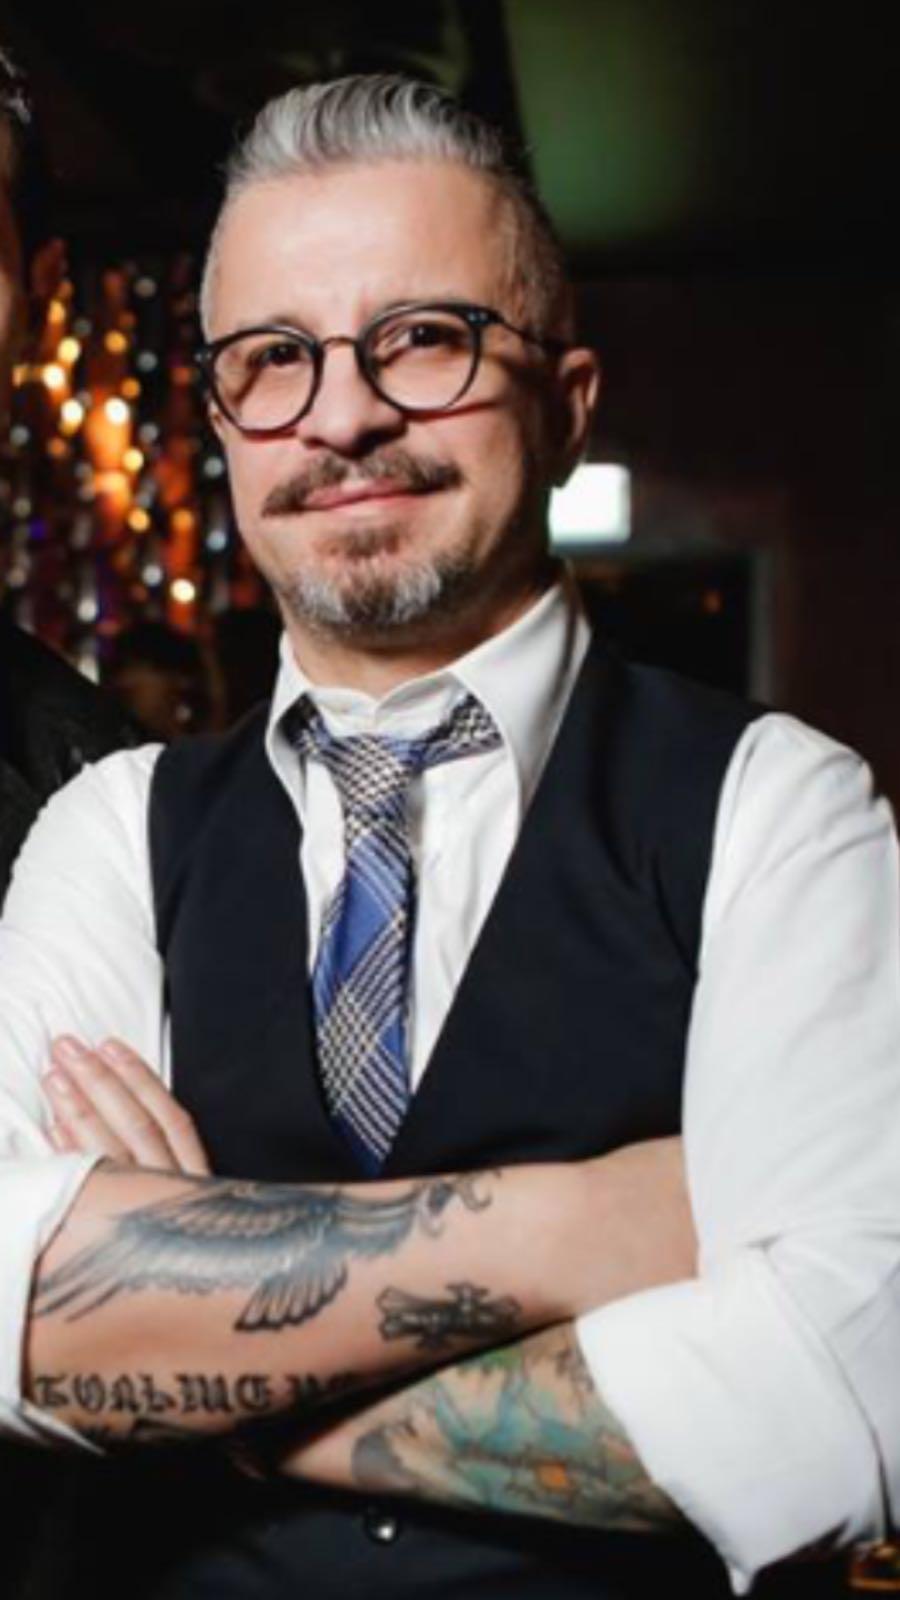 International Celebrity Hotspot – Buddha Bar sets up in NYC